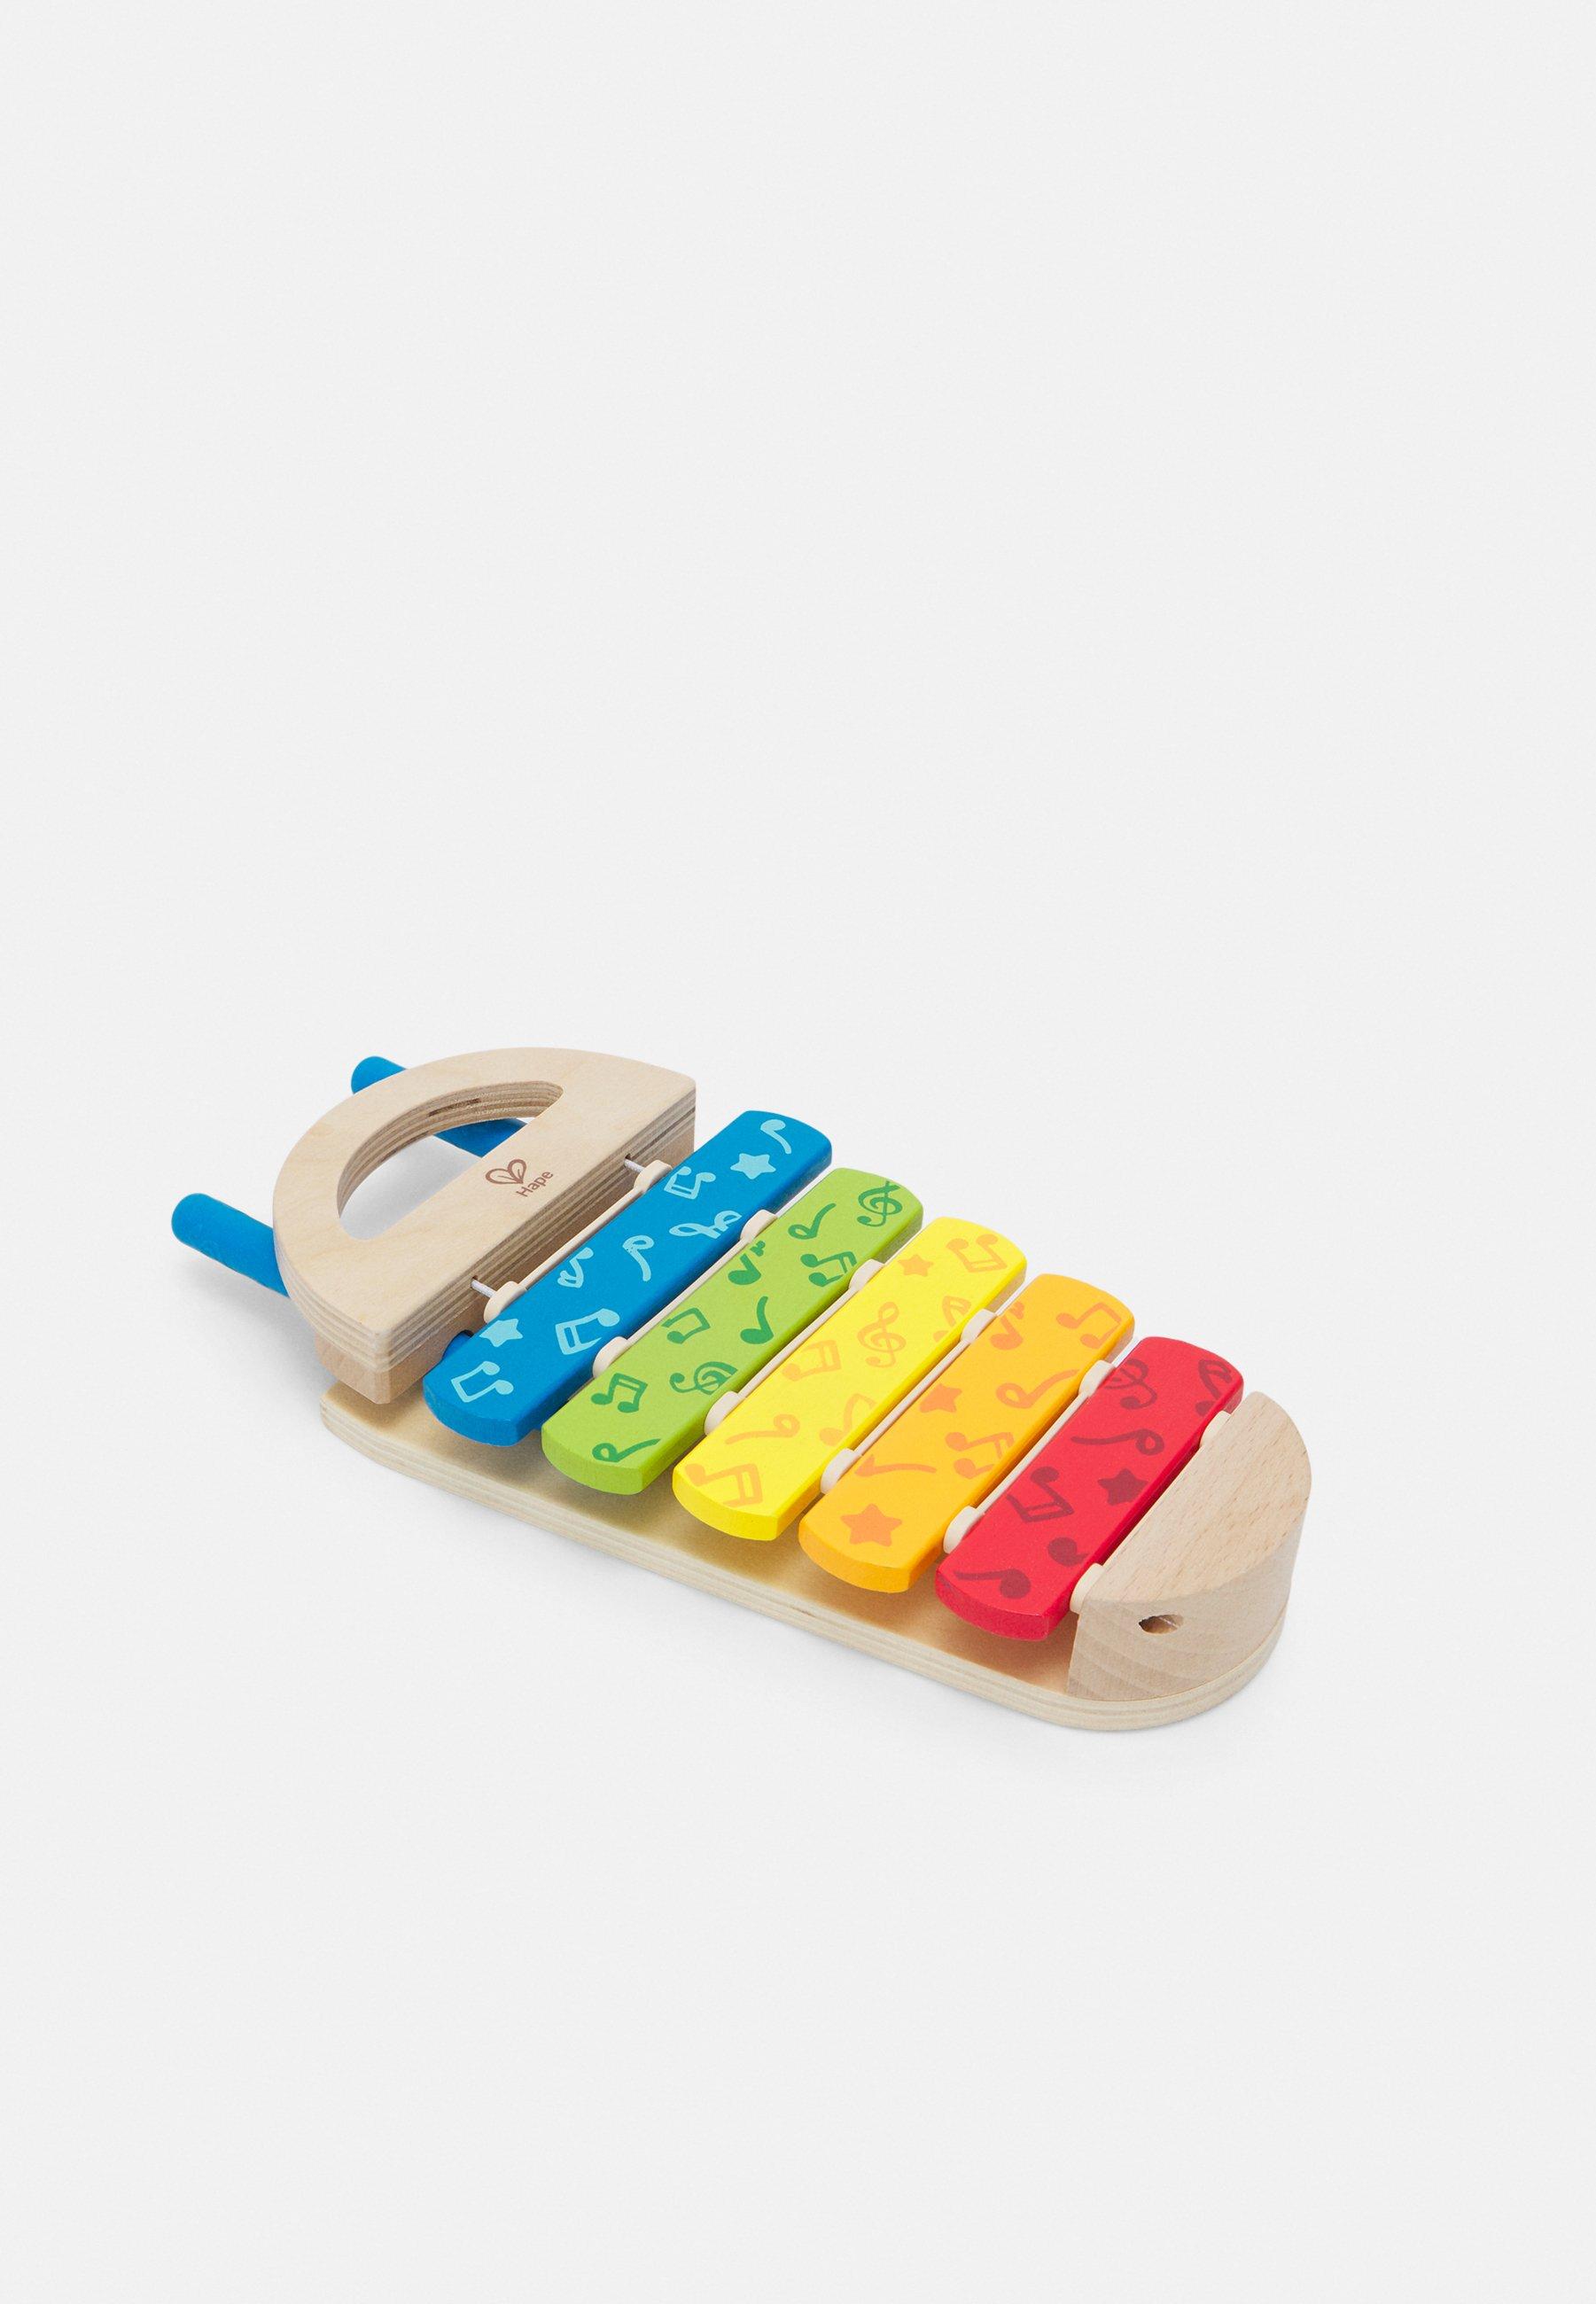 Kinder REGENBOGEN XYLOPHON UNISEX - Spielzeug